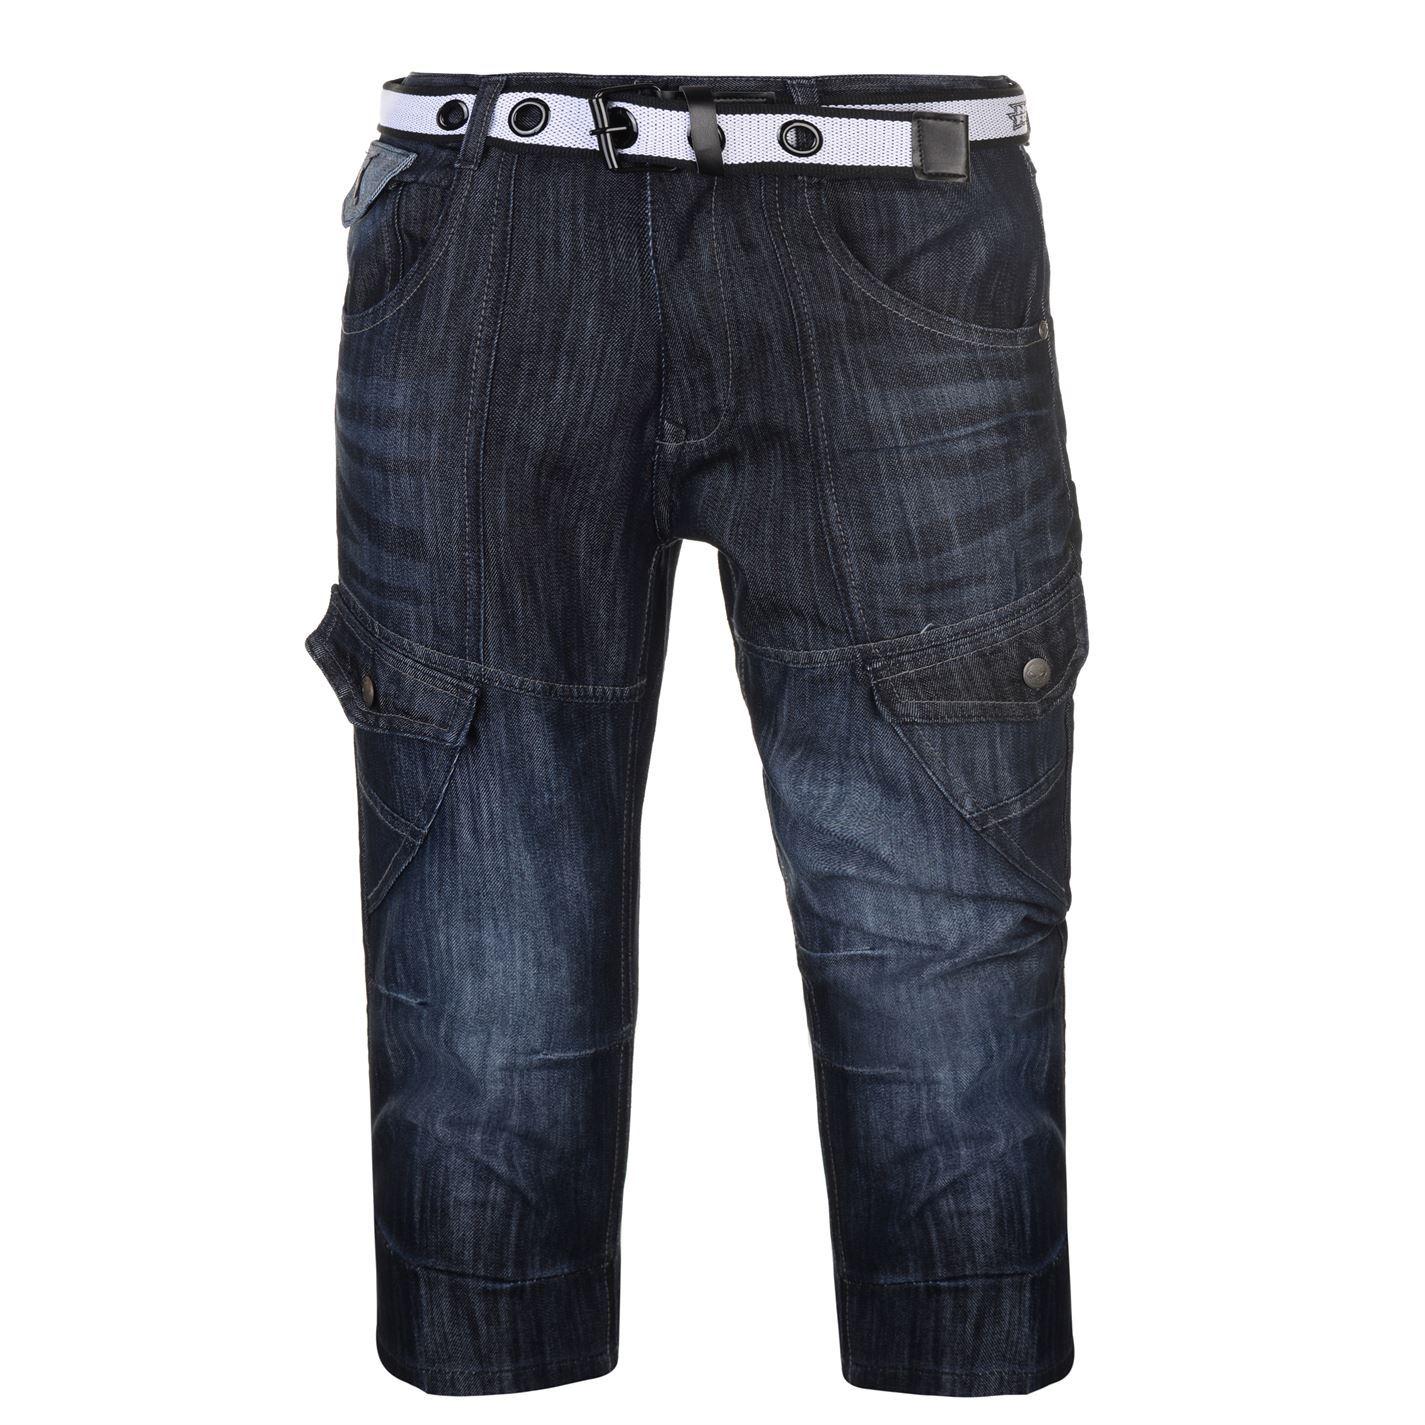 No-Fear-Belted-Cargo-Shorts-Mens-Bottoms-Short-Pants-Summerwear thumbnail 6